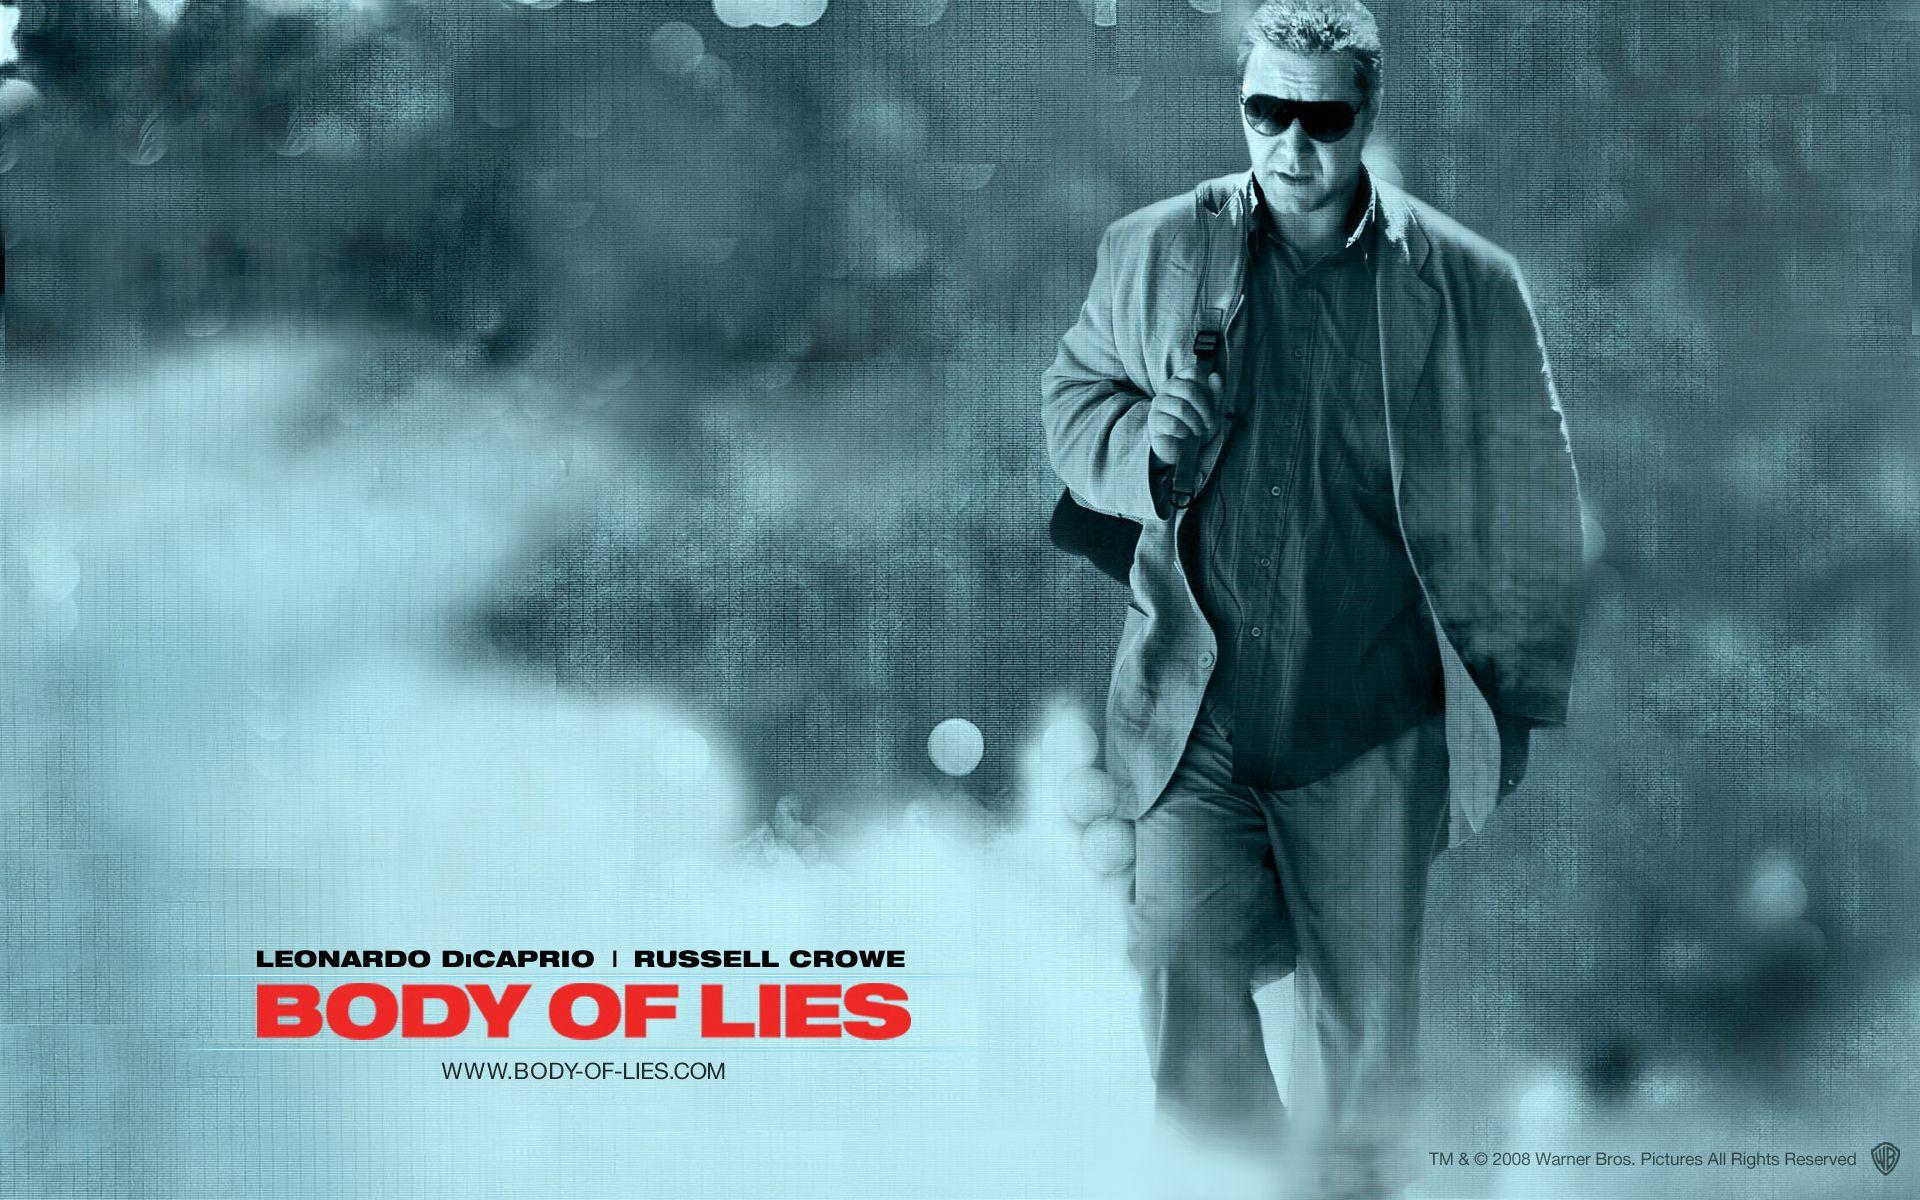 Body of lies body of lies maze runner movie movie genres